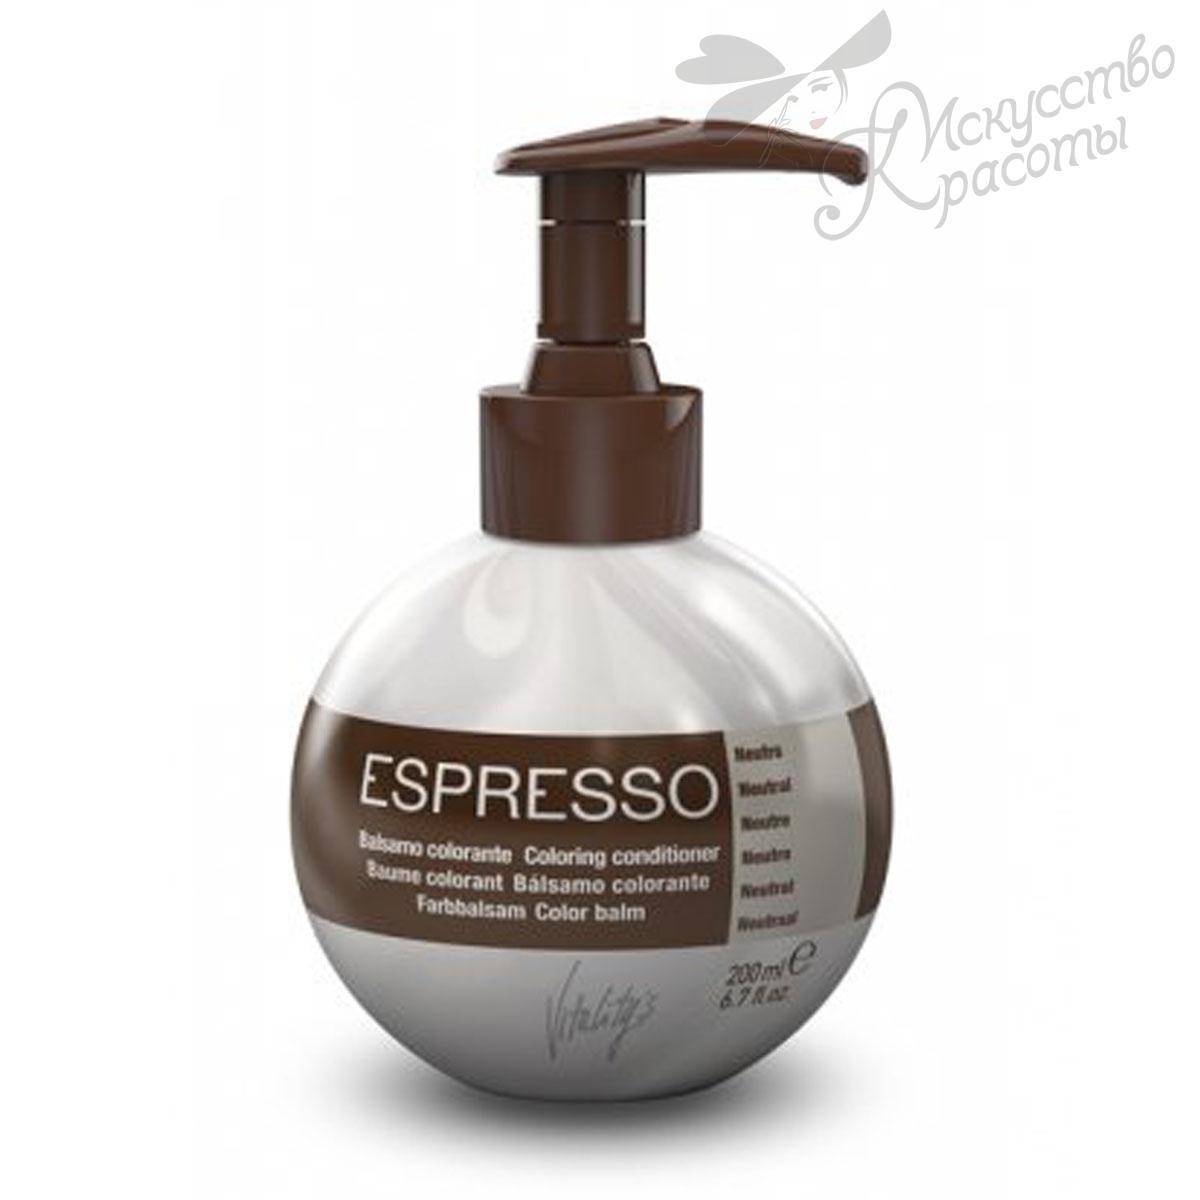 Оттеночный бальзам Vitality's Espresso 9.15 Neutral 200 мл